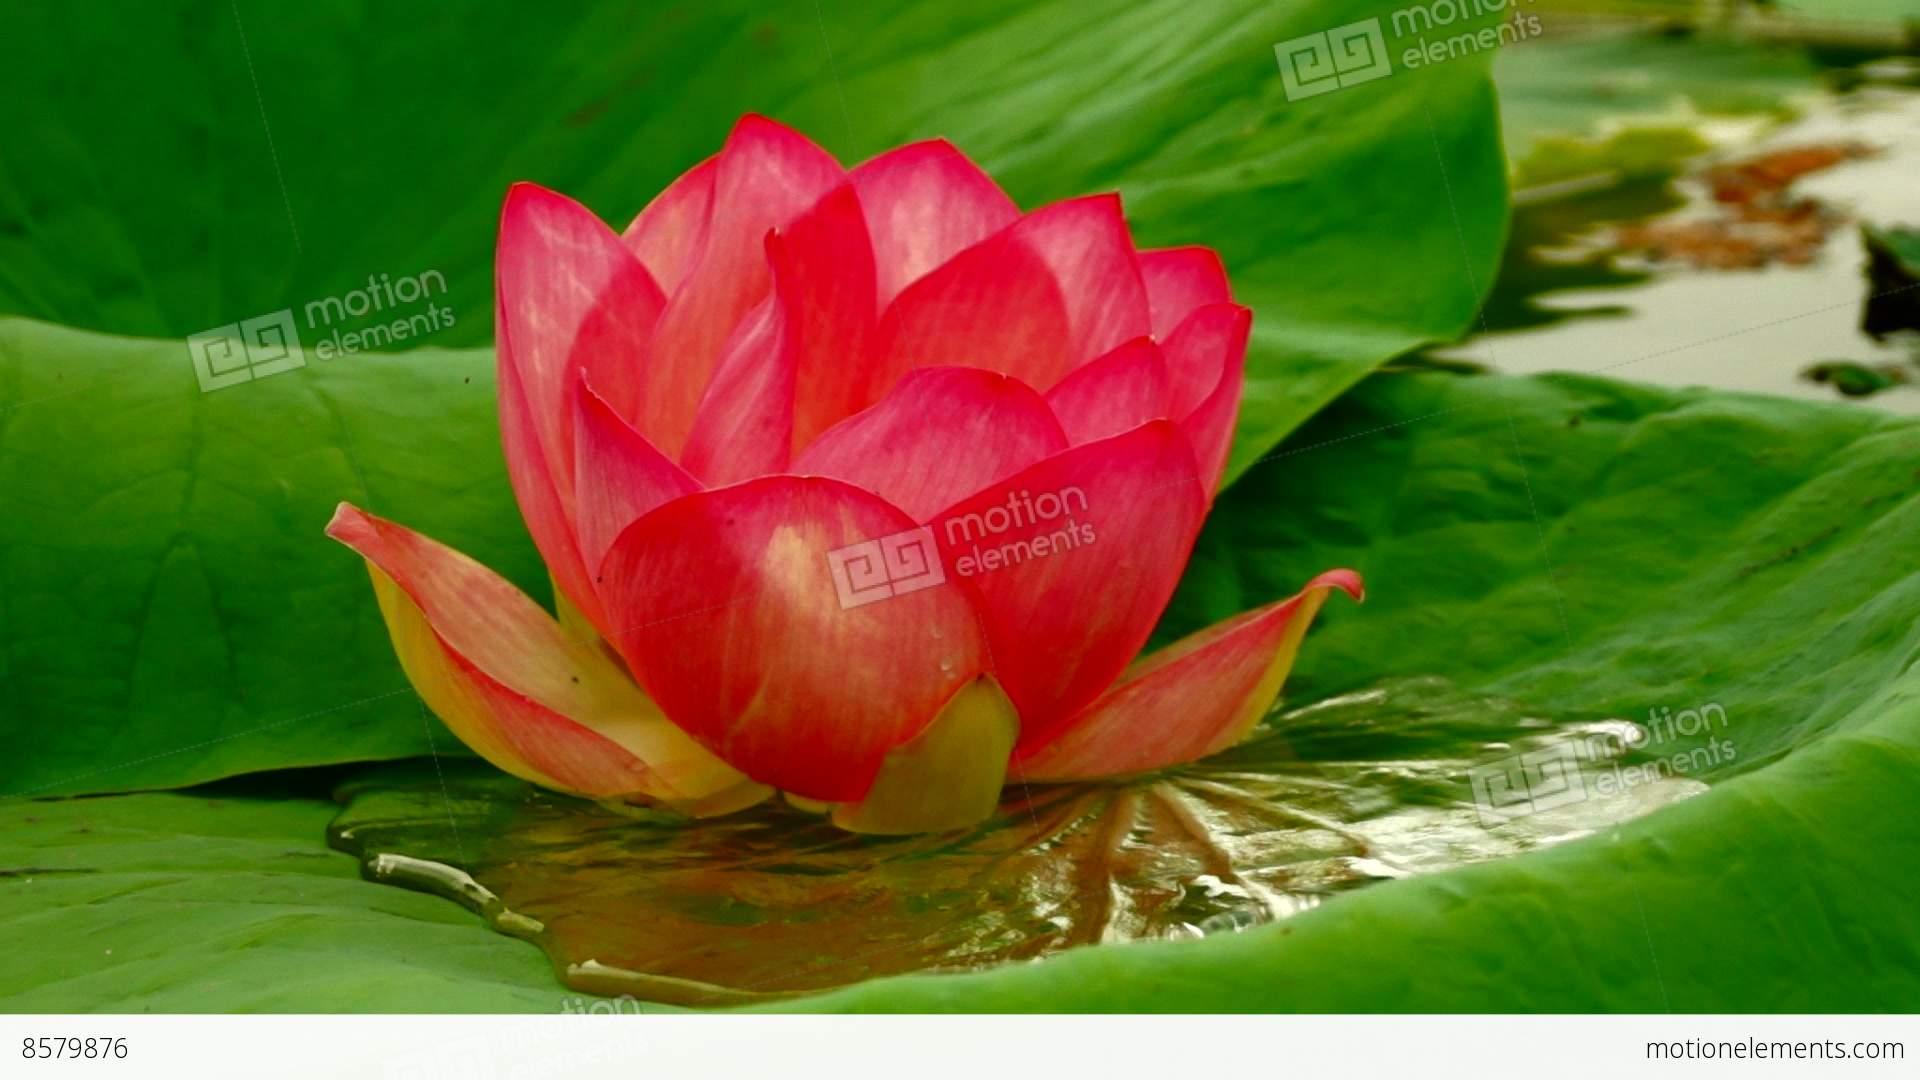 Lotus flower nelumbo nucifera moving by waves on pond stock video lotus flower nelumbo nucifera moving by waves on pond stock video footage izmirmasajfo